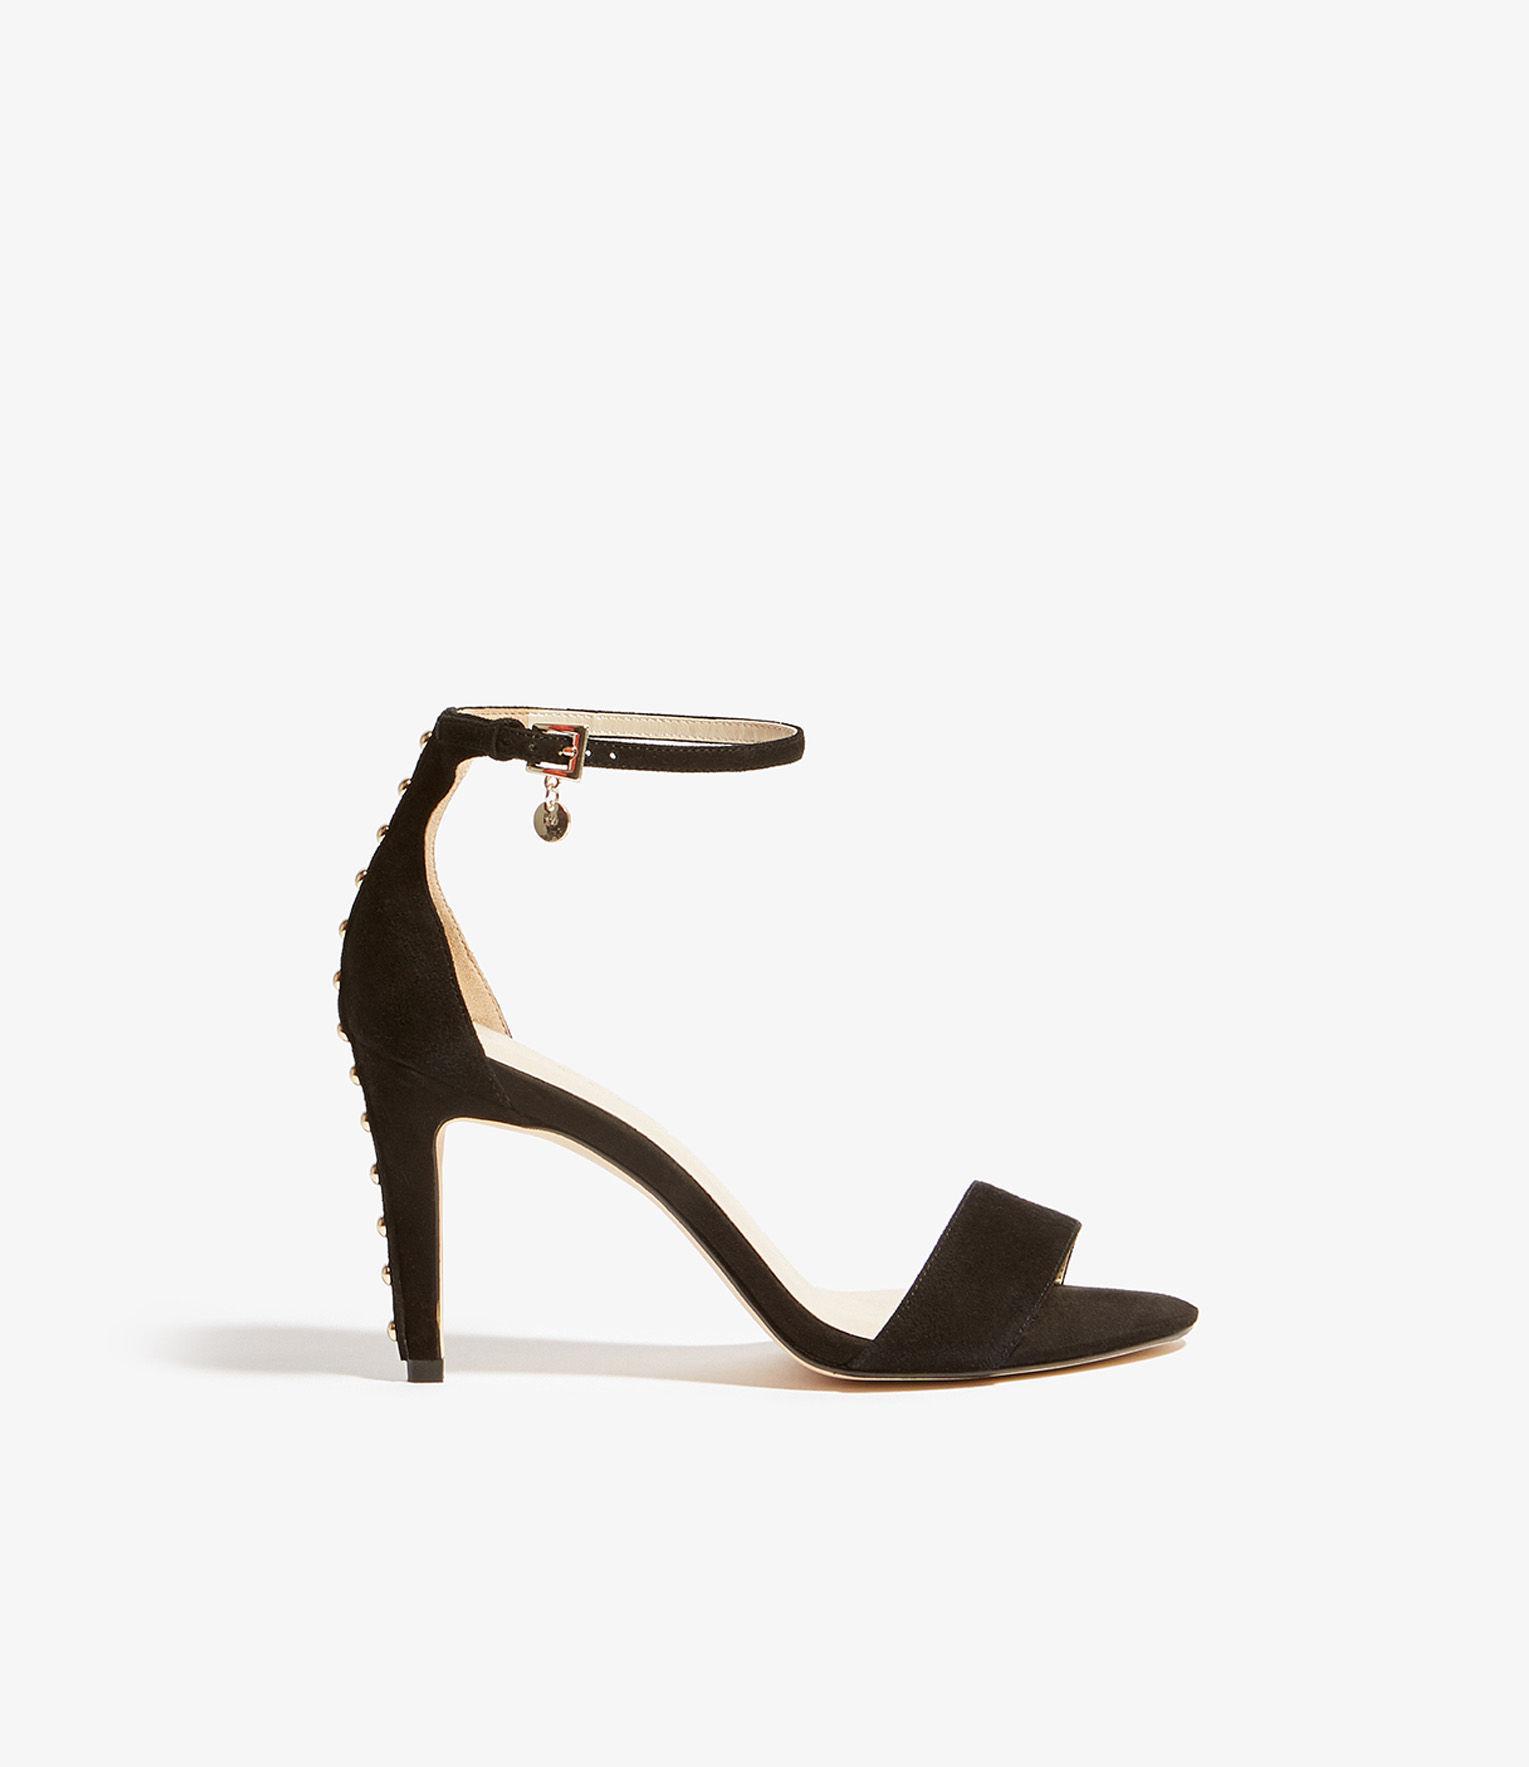 d112f2fd95d Karen Millen Studded Heeled Sandals in Black - Save 70% - Lyst